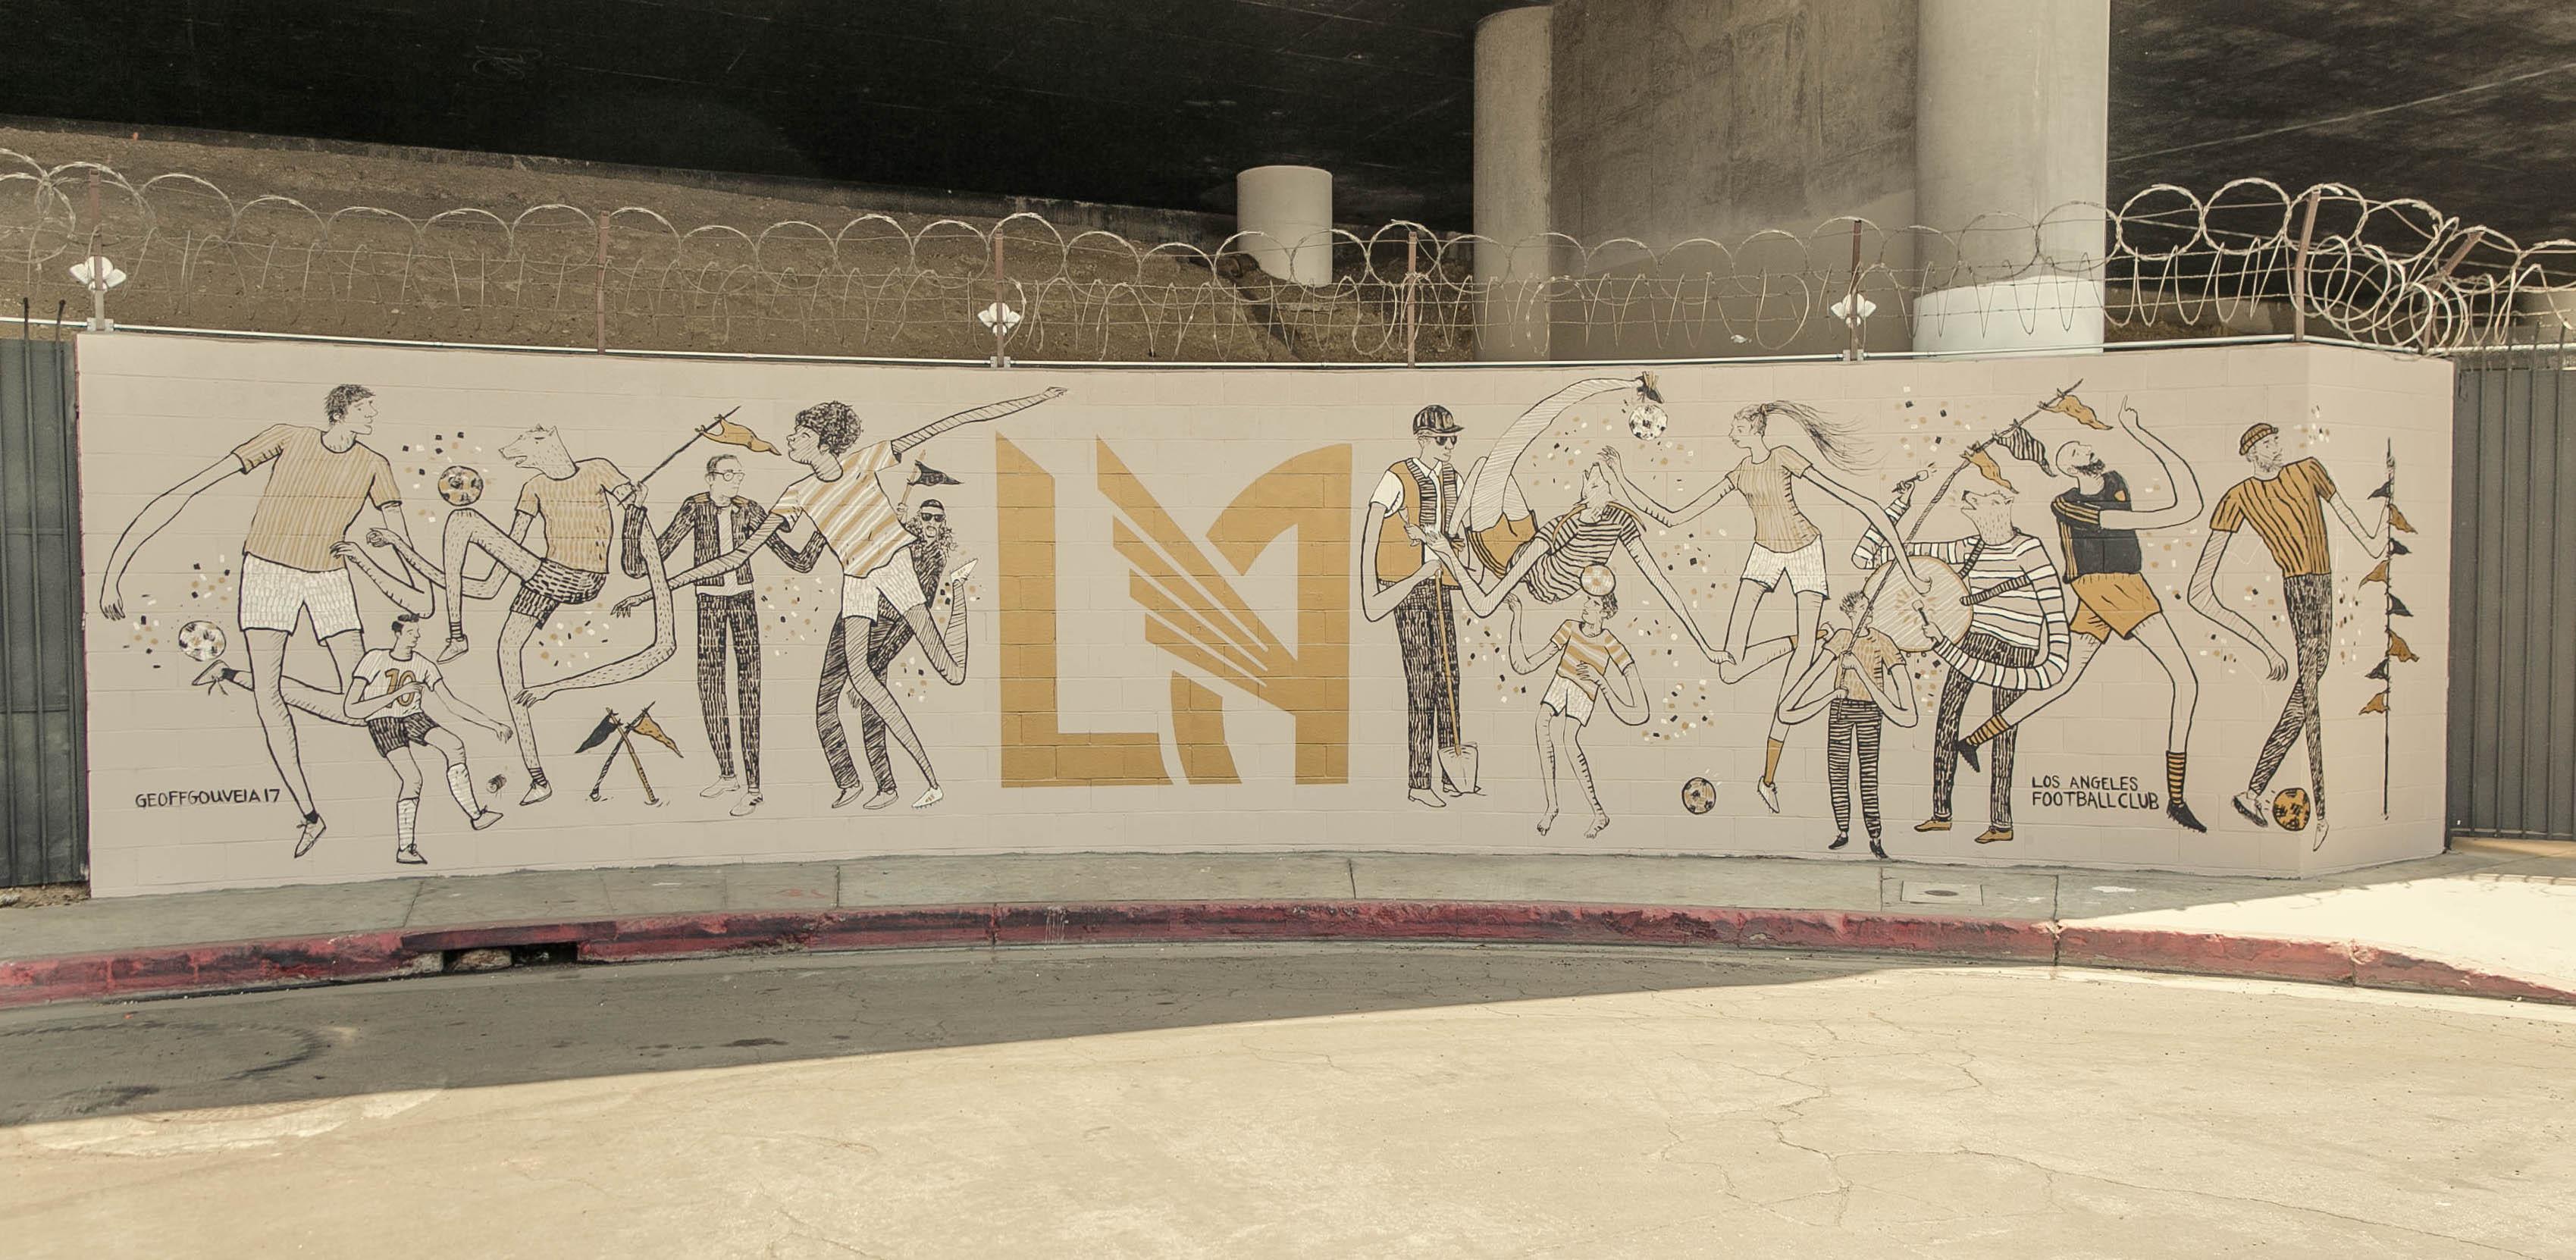 lafc_mural